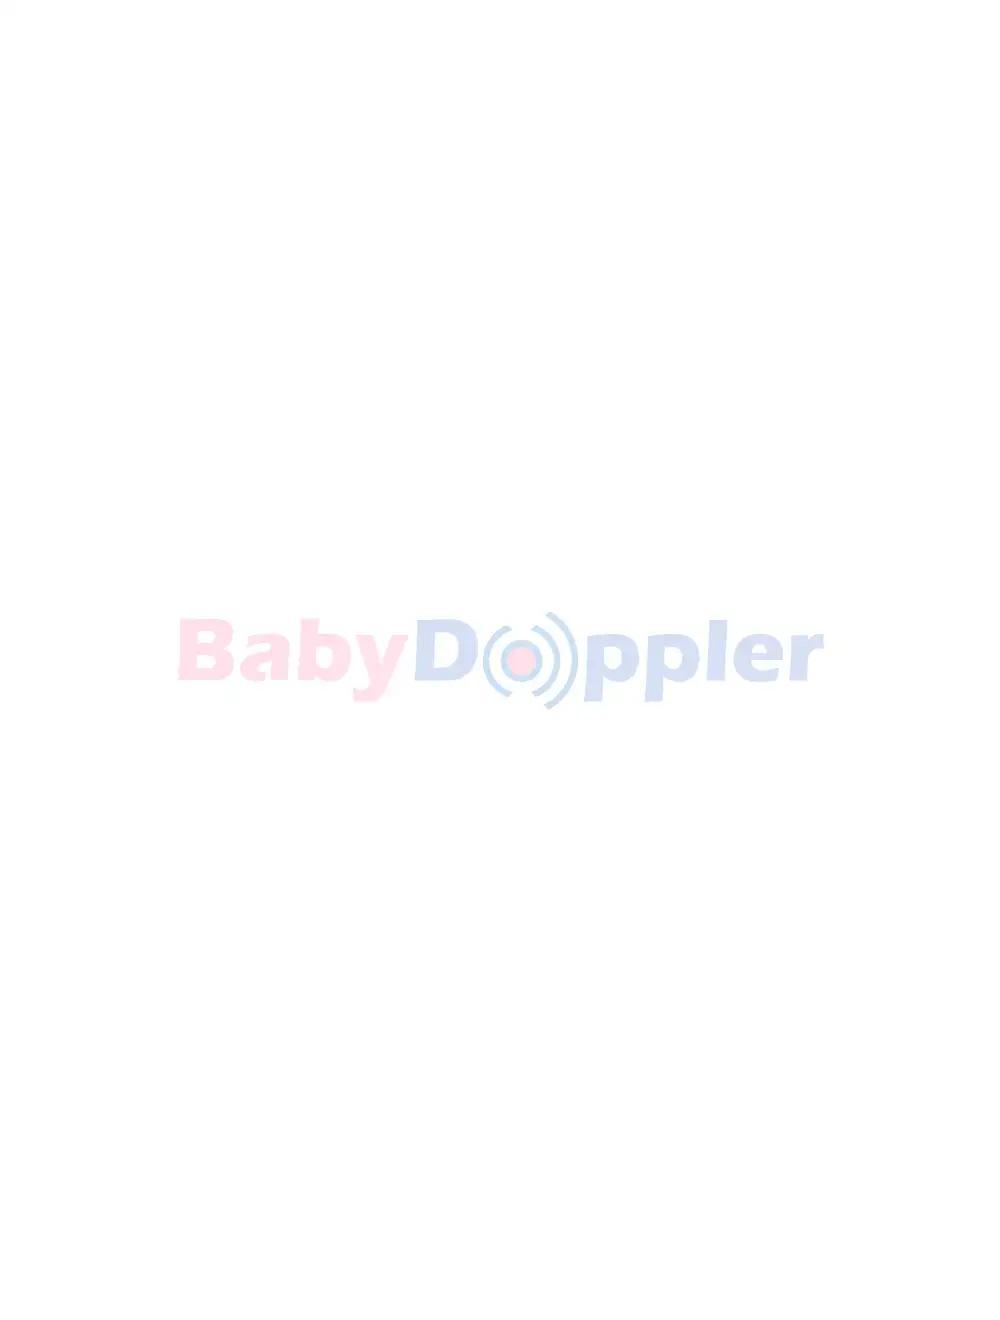 bottle with serenity brest pump by baby doppler